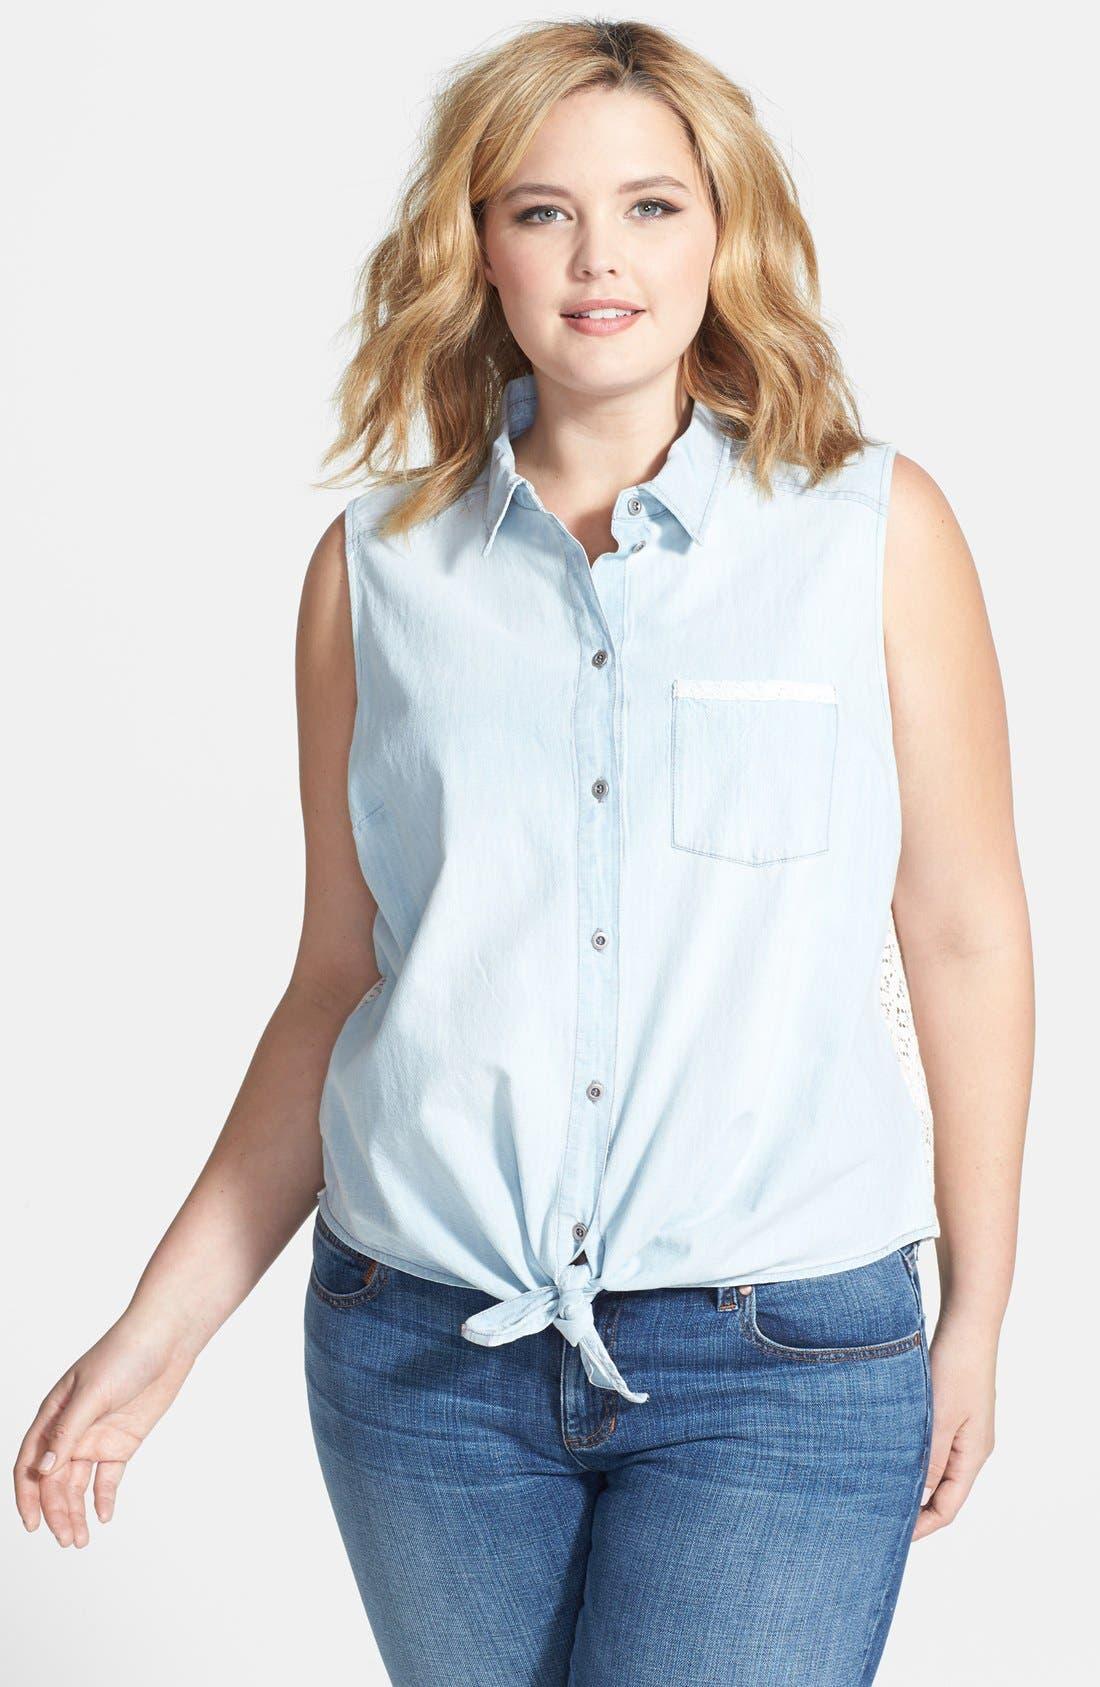 Main Image - Jessica Simpson 'Soul' Sleeveless Tie Front Mixed Media Shirt (Plus Size)